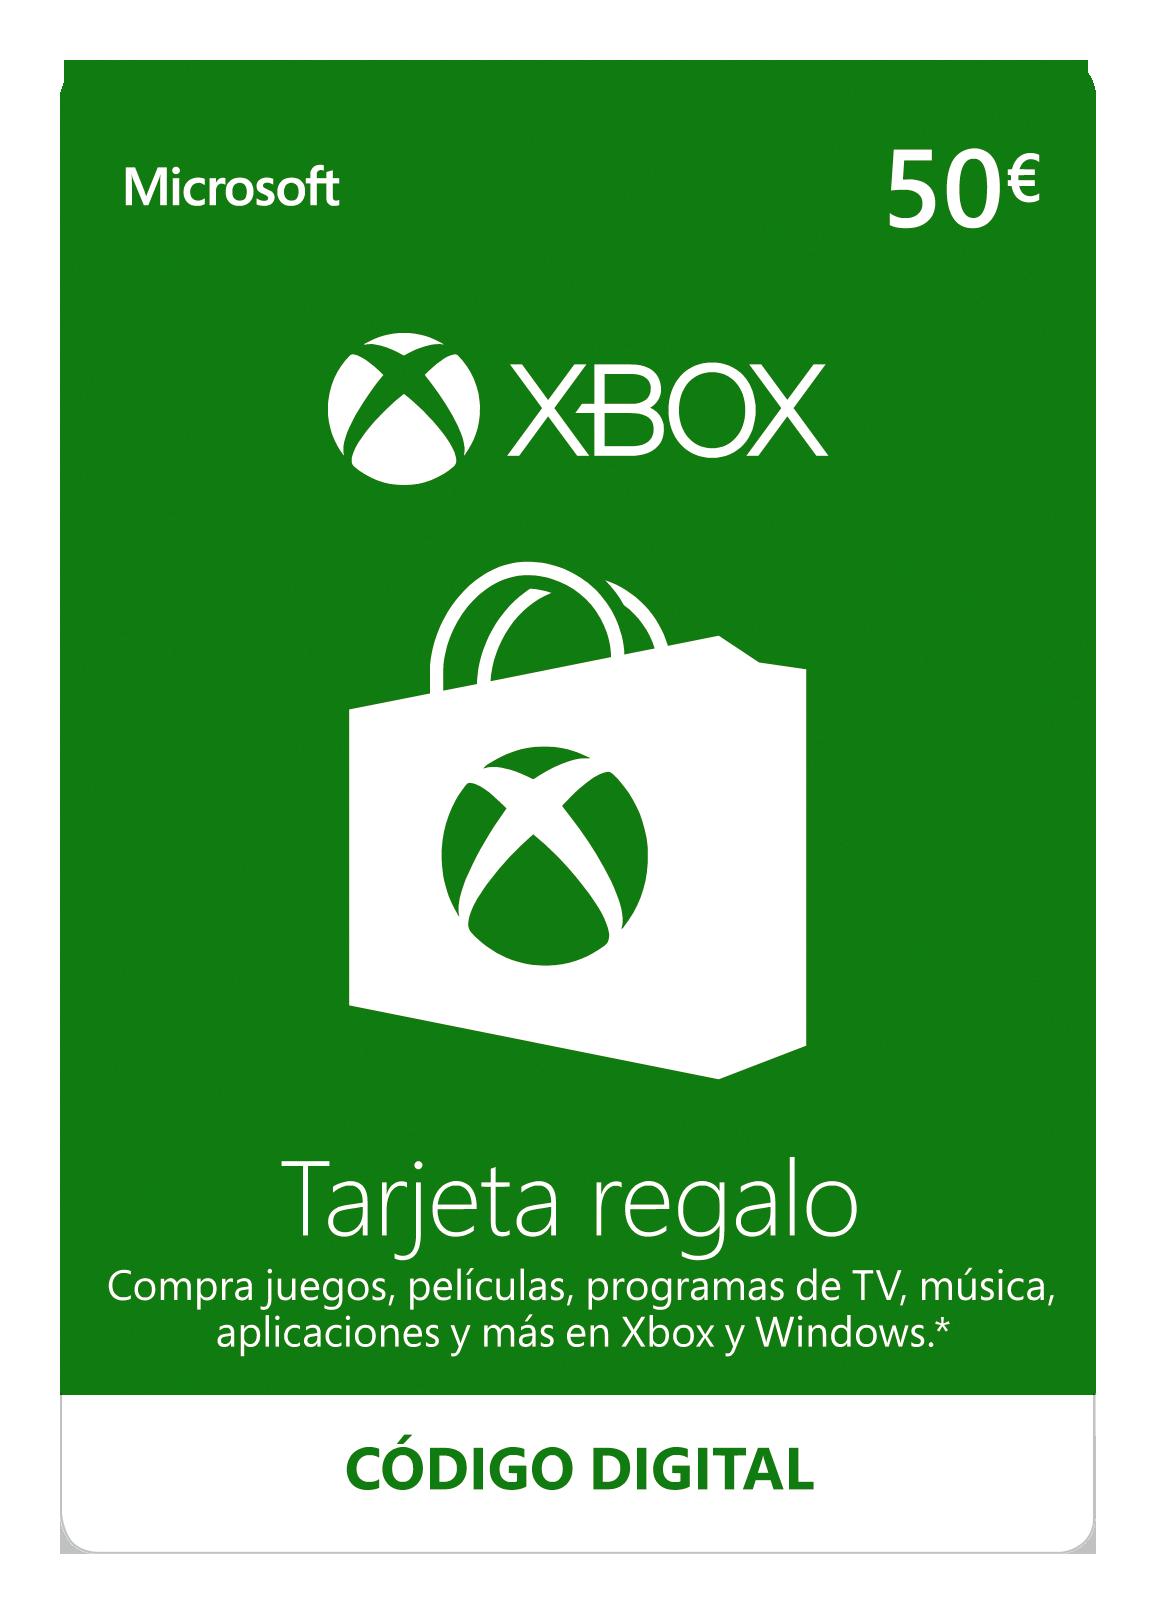 Xbox Live - 50 EUR Tarjeta Regalo [Xbox Live Código Digital]